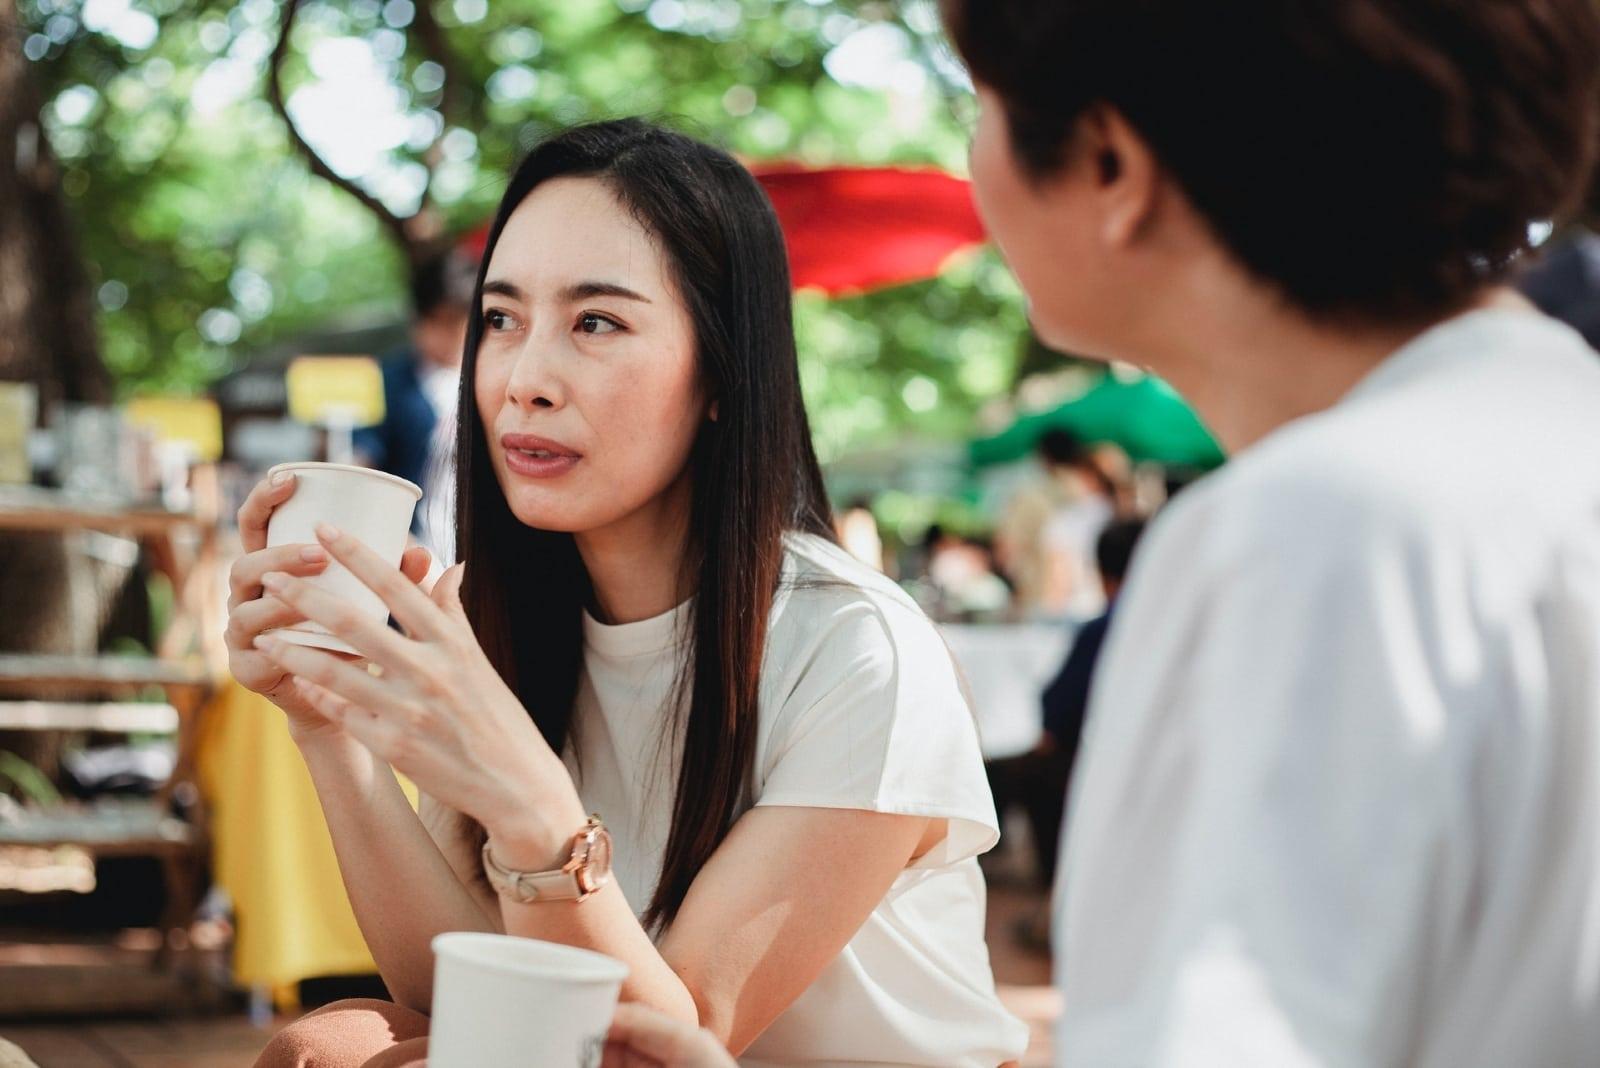 woman talking to woman while having coffee